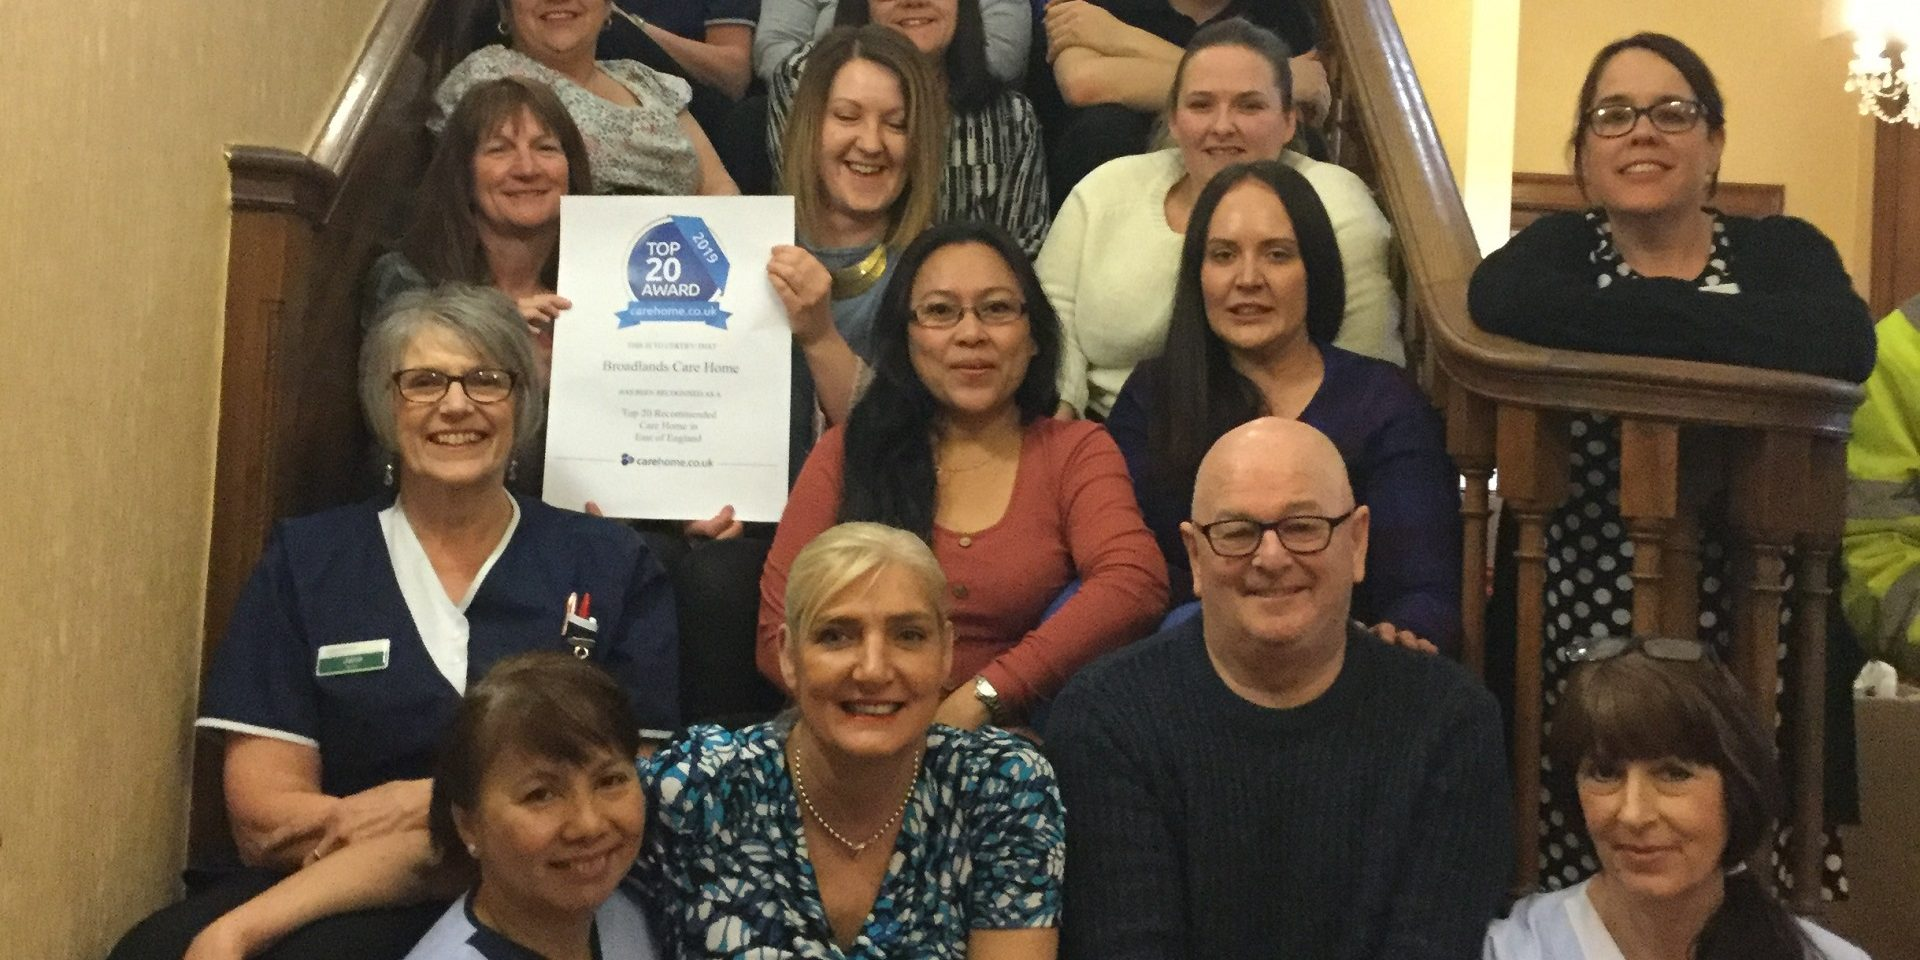 Broadlands receives Top 20 Care Home Award